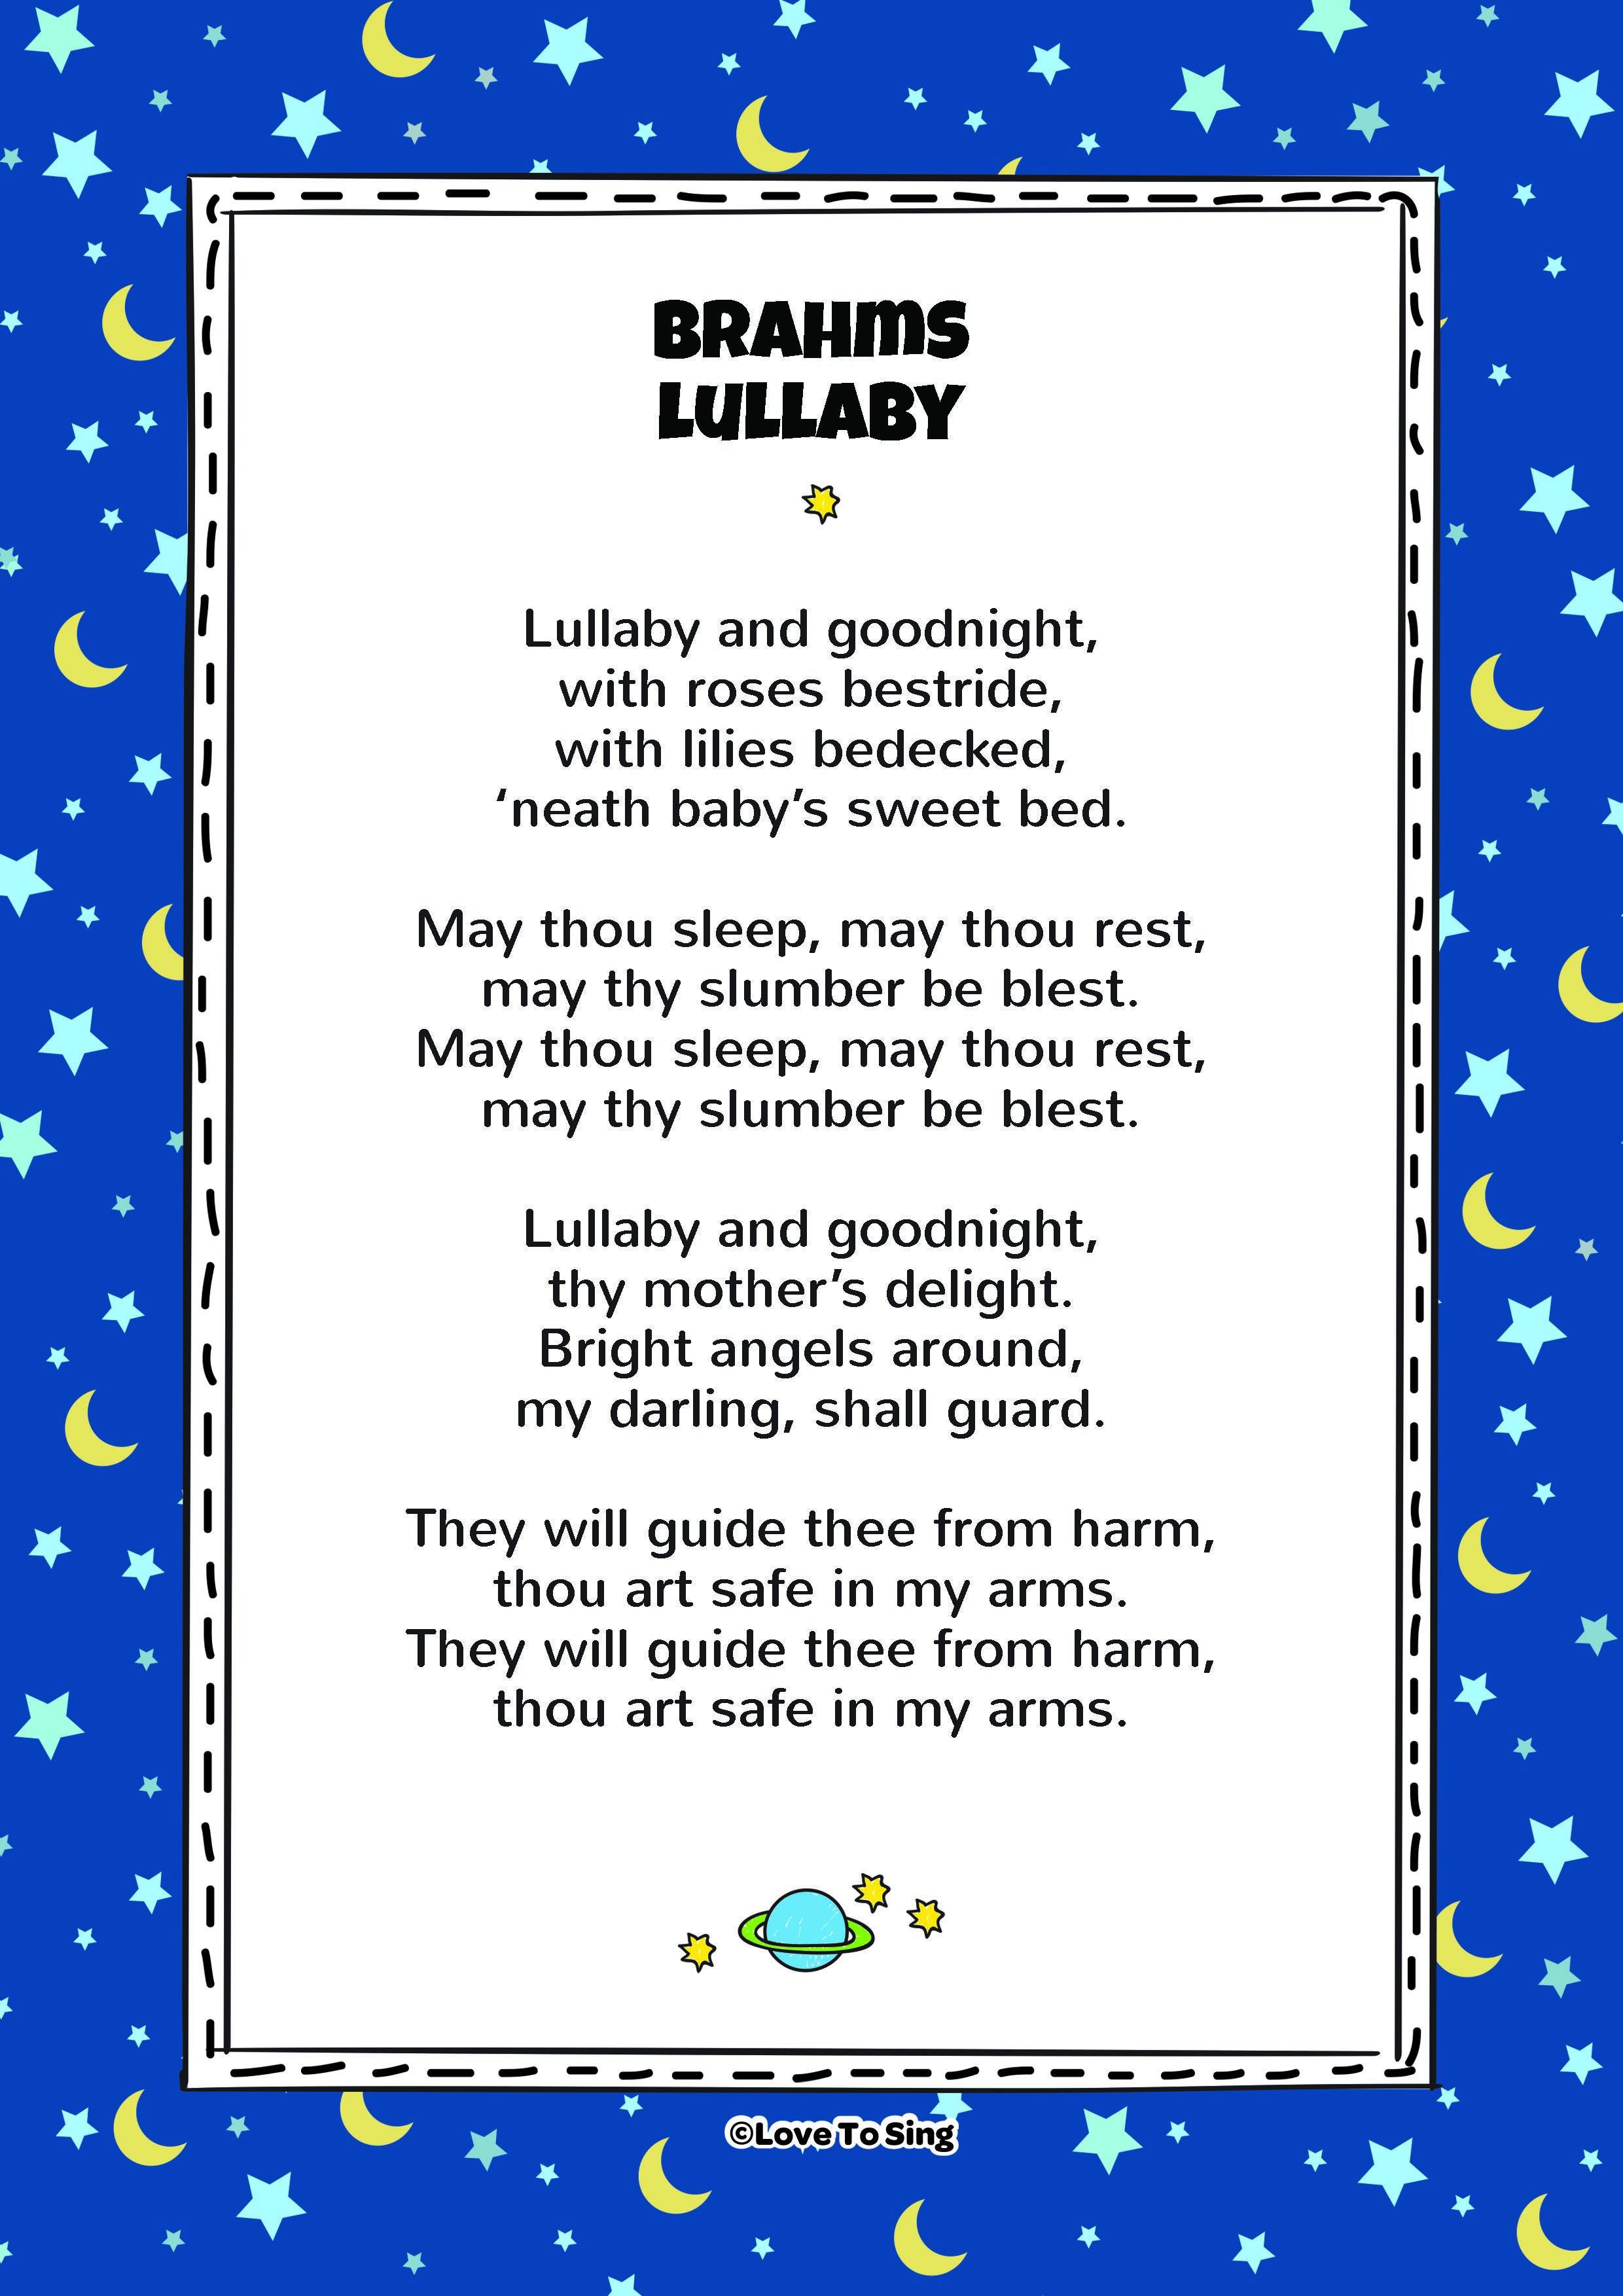 Brahms Lullaby Nursery Rhymes Lyrics